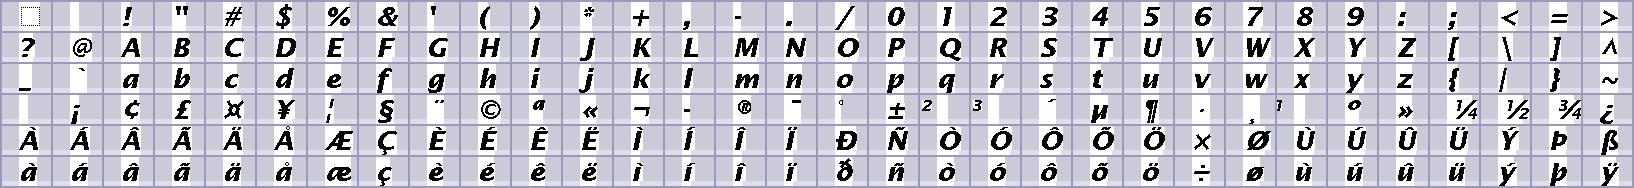 Rasher's Rockbox related stuff - Fonts - 100dpi